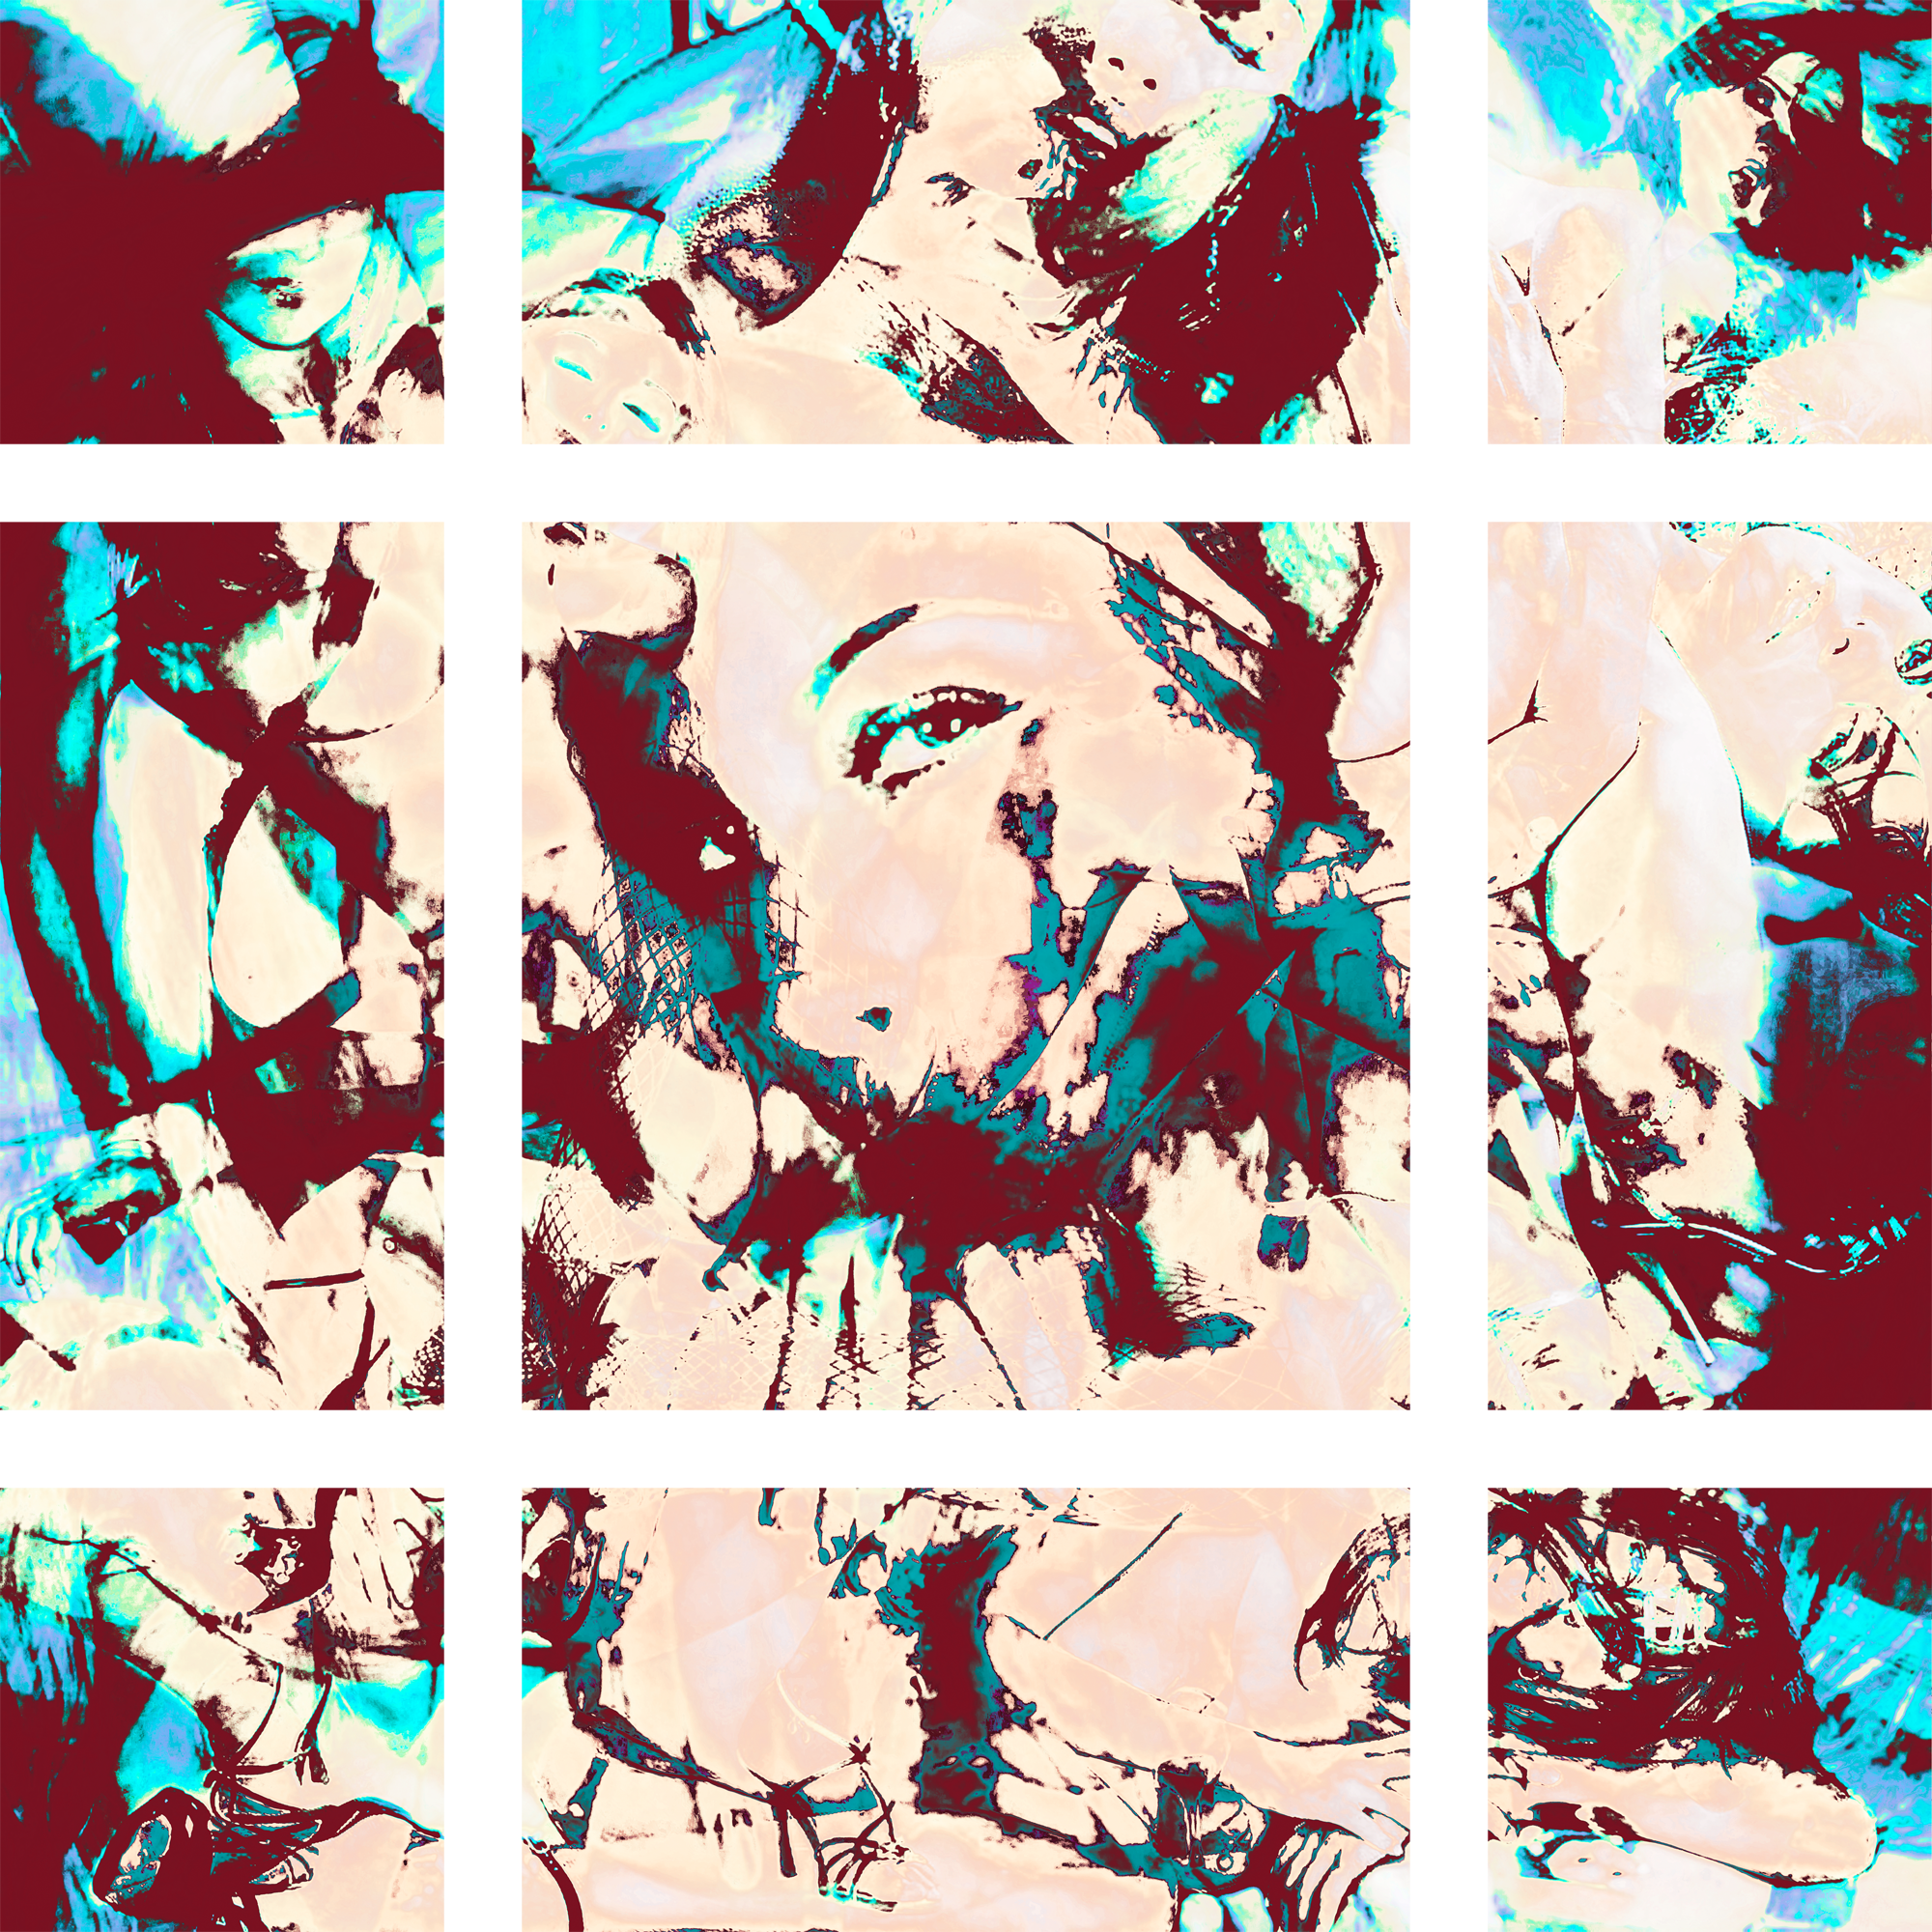 Overdose 2.0 (Alpha&Omega) 01, 2011